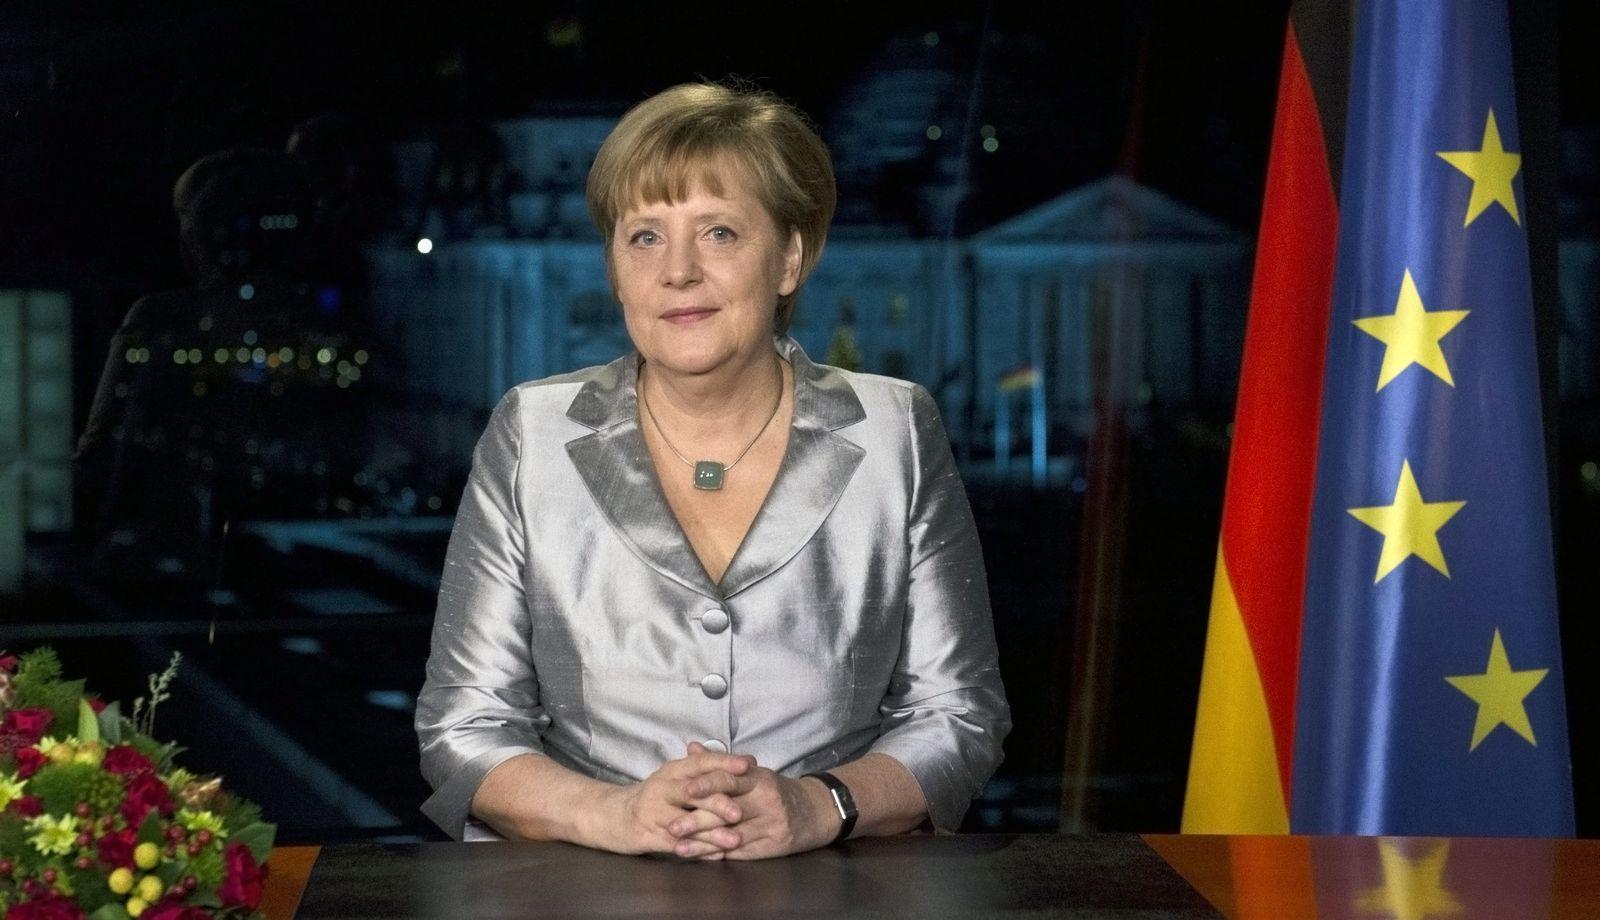 Merkel / Neujahrsansprache